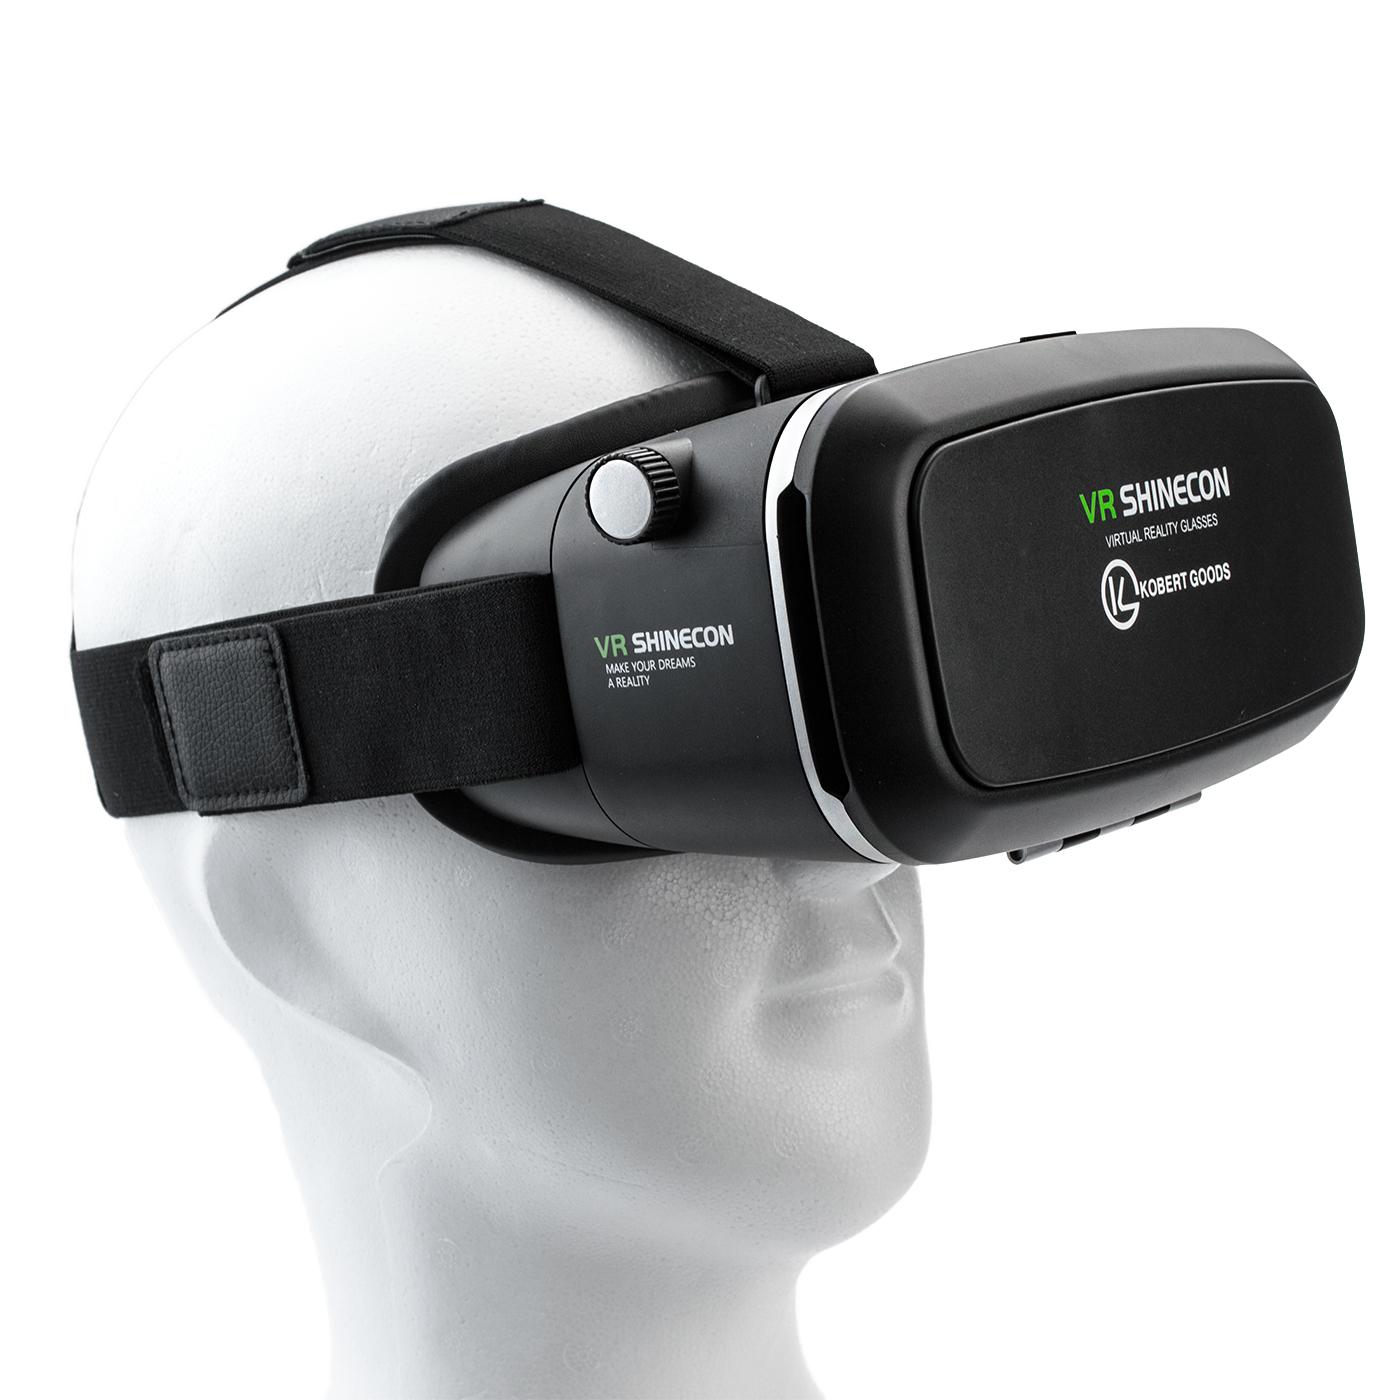 vr shinecon virtual reality brille 3d spiel brille karton video movie 3 5 6 zoll ebay. Black Bedroom Furniture Sets. Home Design Ideas